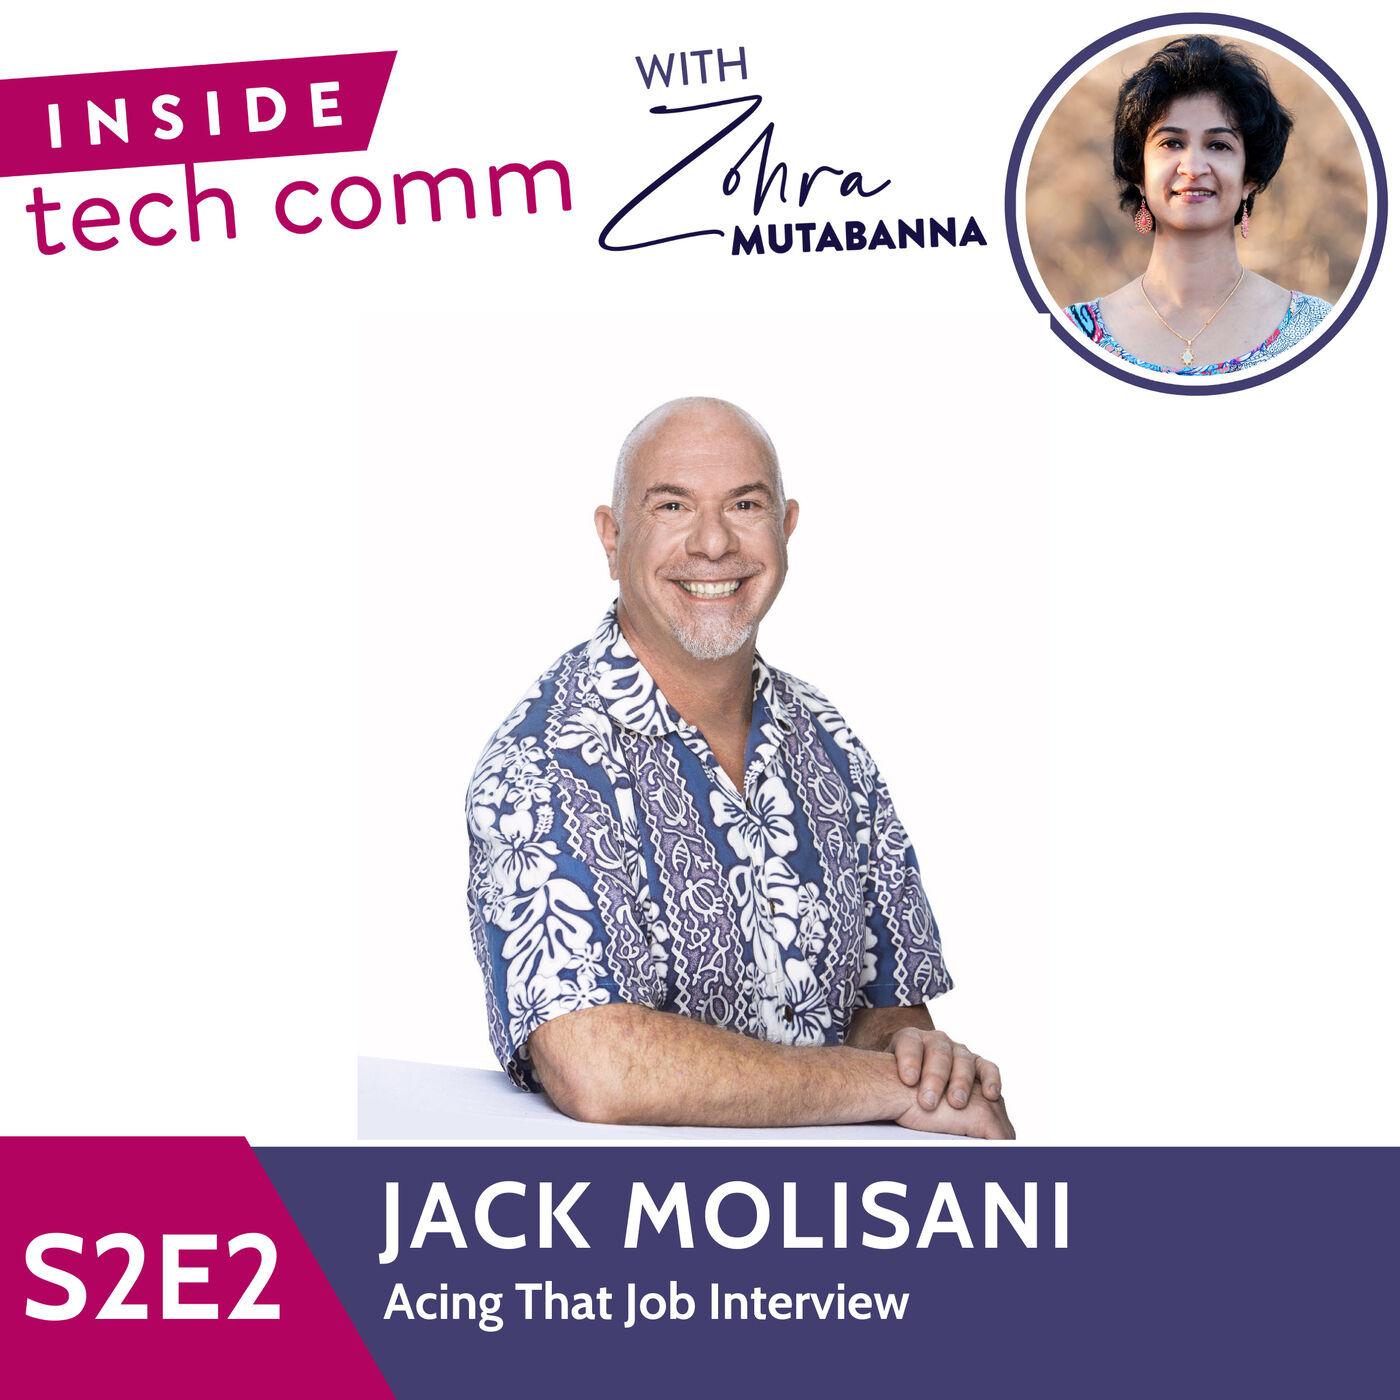 S2E2 Acing That Job Interview with Jack Molisani